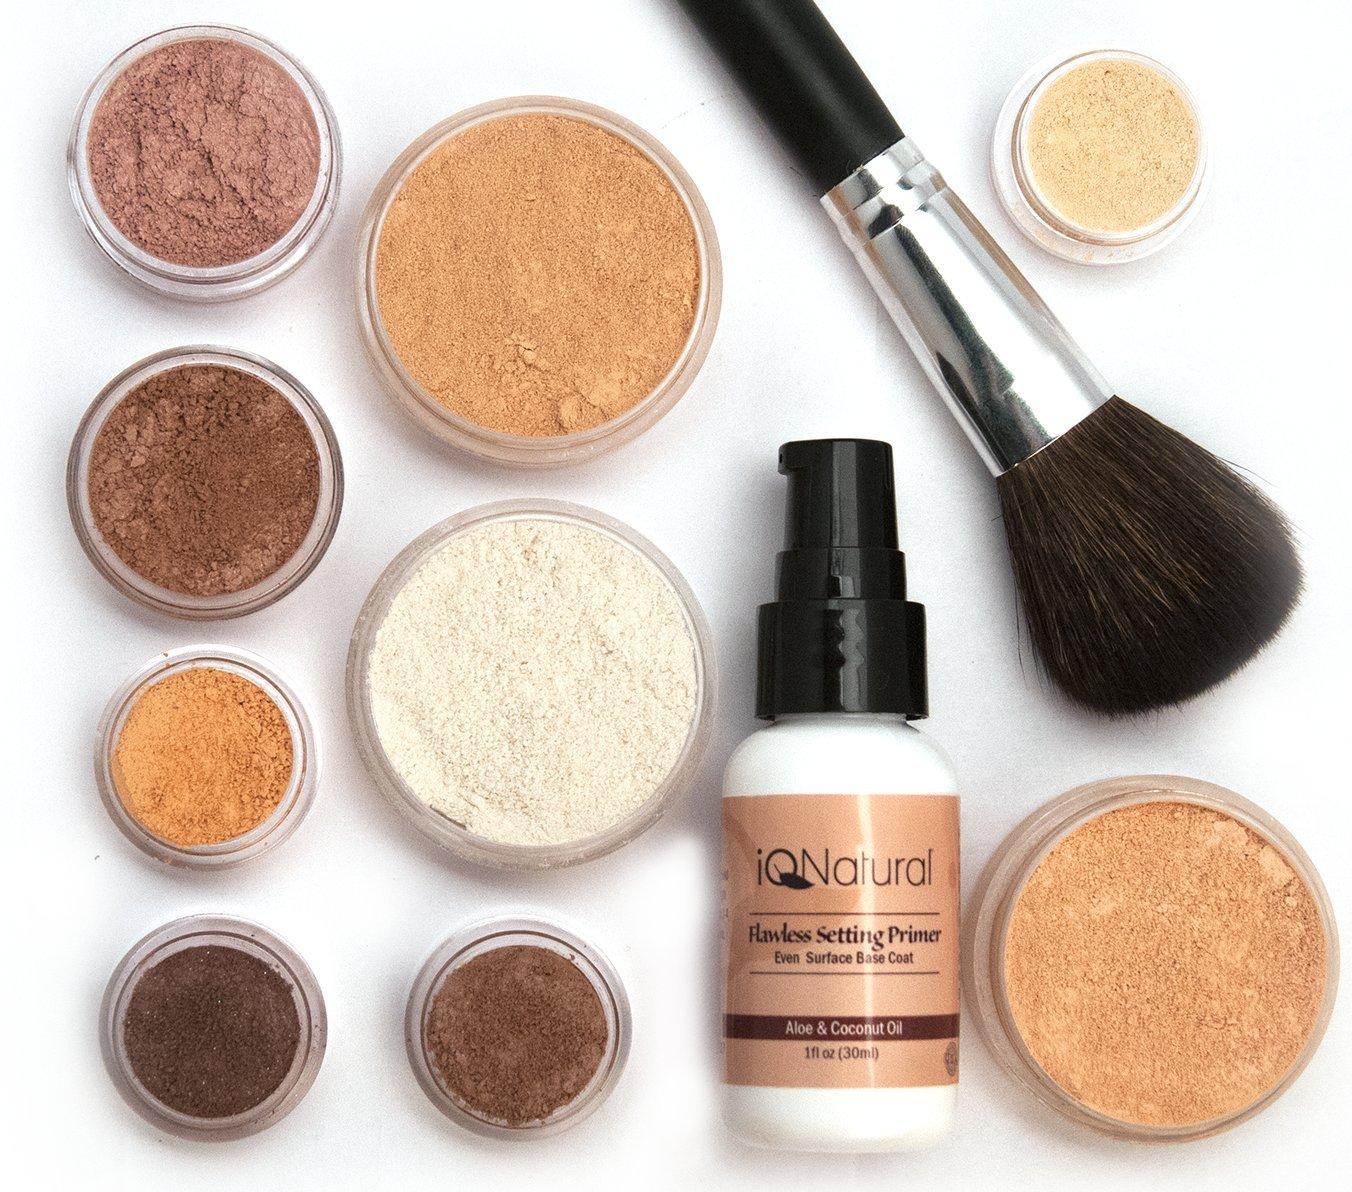 iQ Natural Mineral Makeup Starter Kit - Powder Brush, Silk Primer, Mineral Foundation, Setting Veil, Bisque Concealer, Bronzer + Eye Shadow for Flawless Bare Looking Skin, Full Set (Fair)